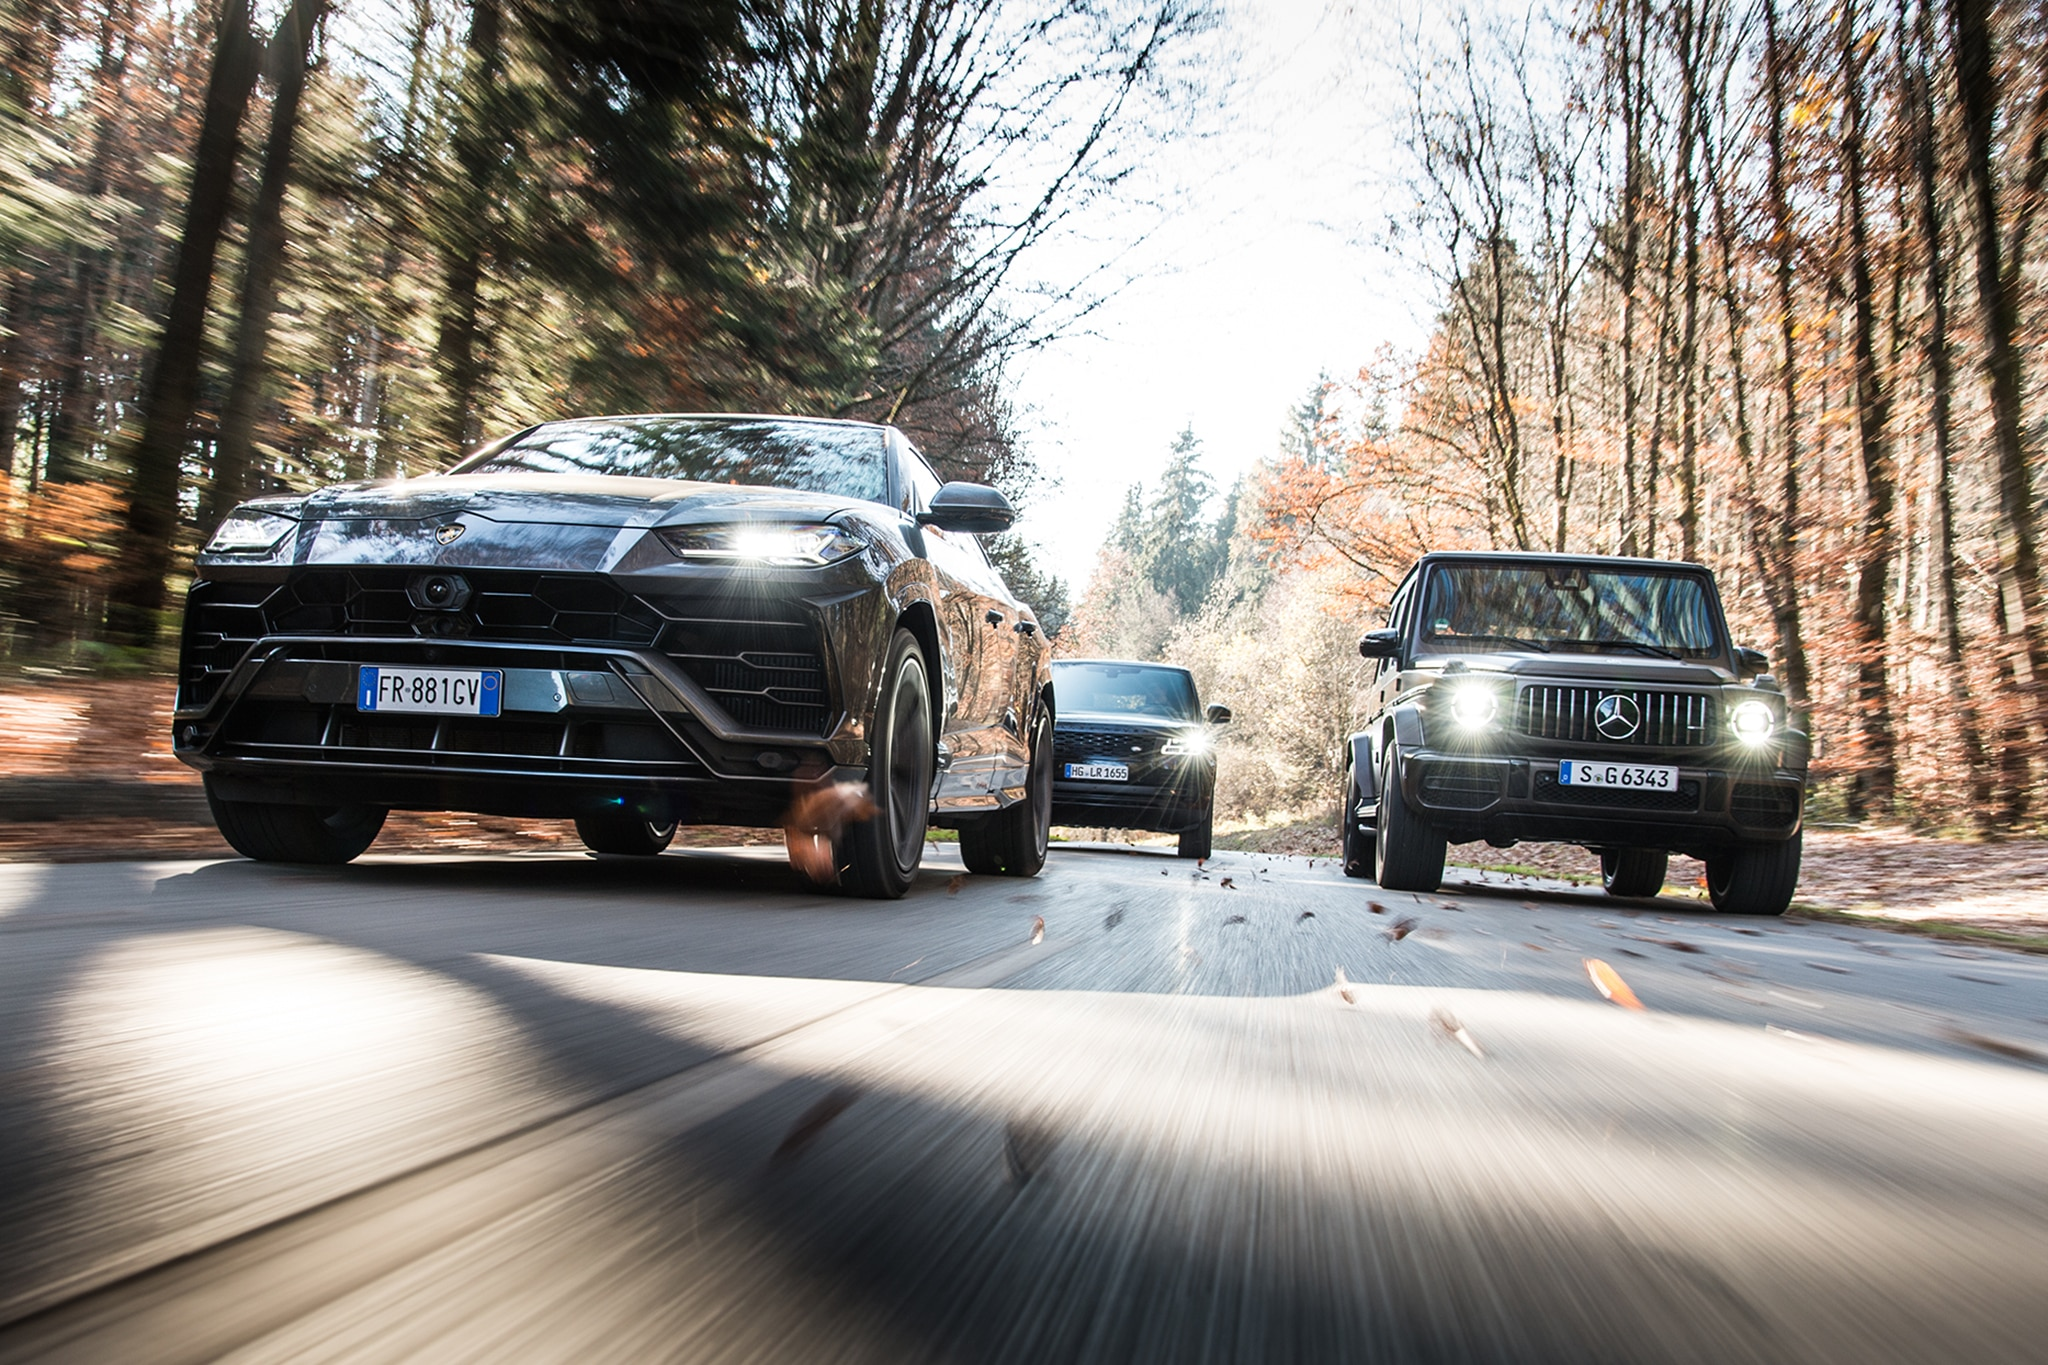 2019 Lamborghini Urus Vs 2019 Mercedes AMG G63 Vs 2019 Range Rover Vogue 89